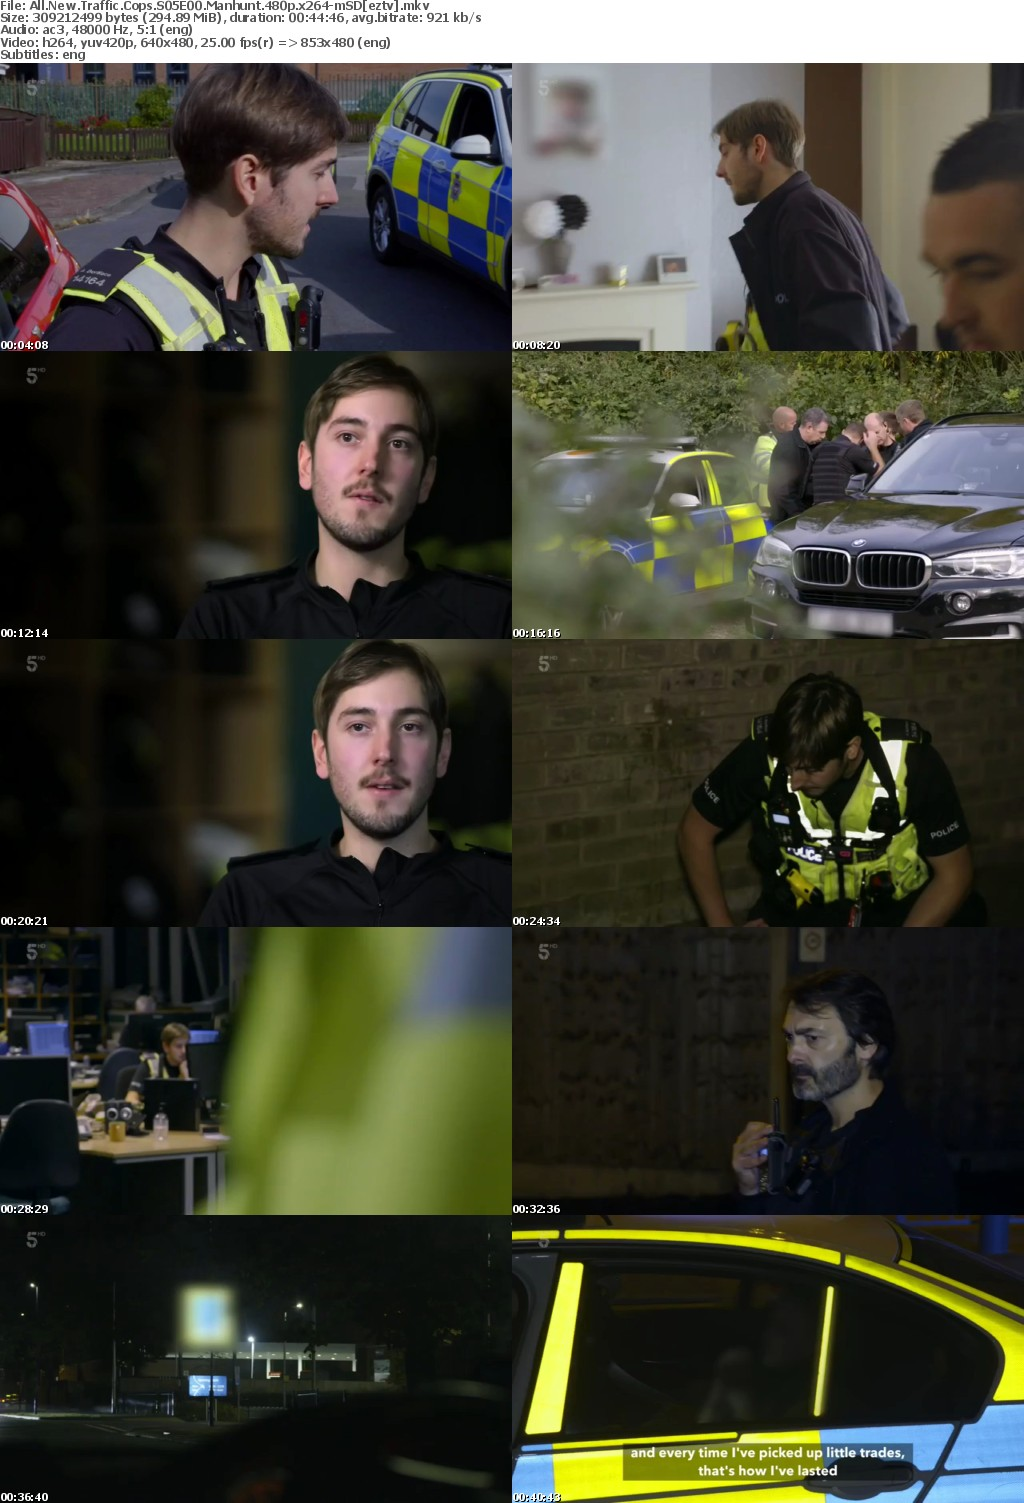 All New Traffic Cops S05E00 Manhunt 480p x264-mSD